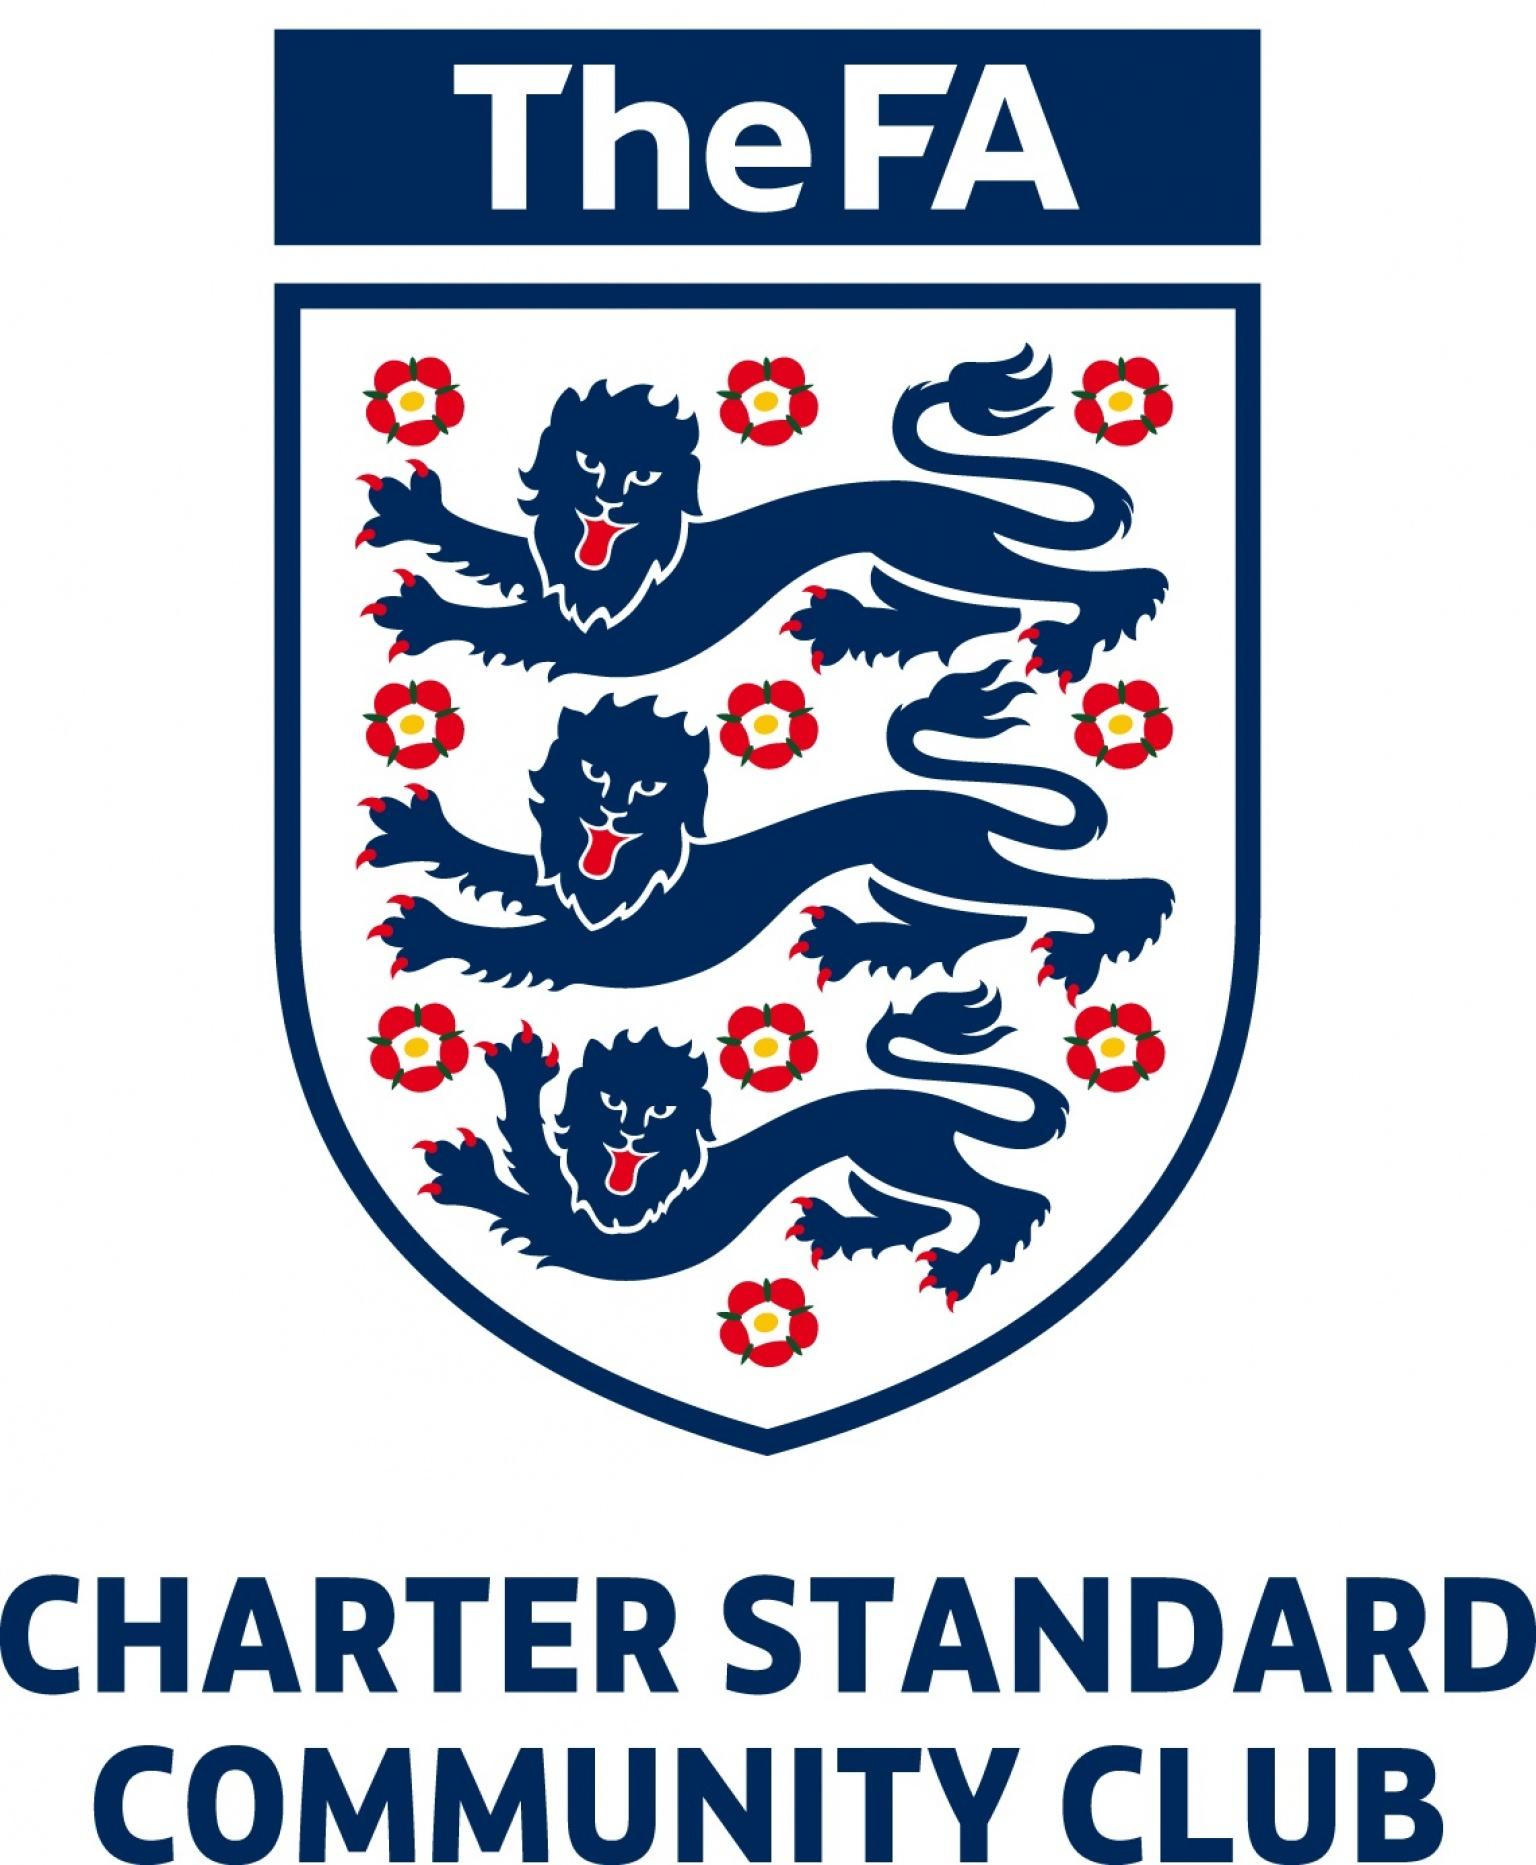 Immingham Town Football Club is a Charter Standard Community Club